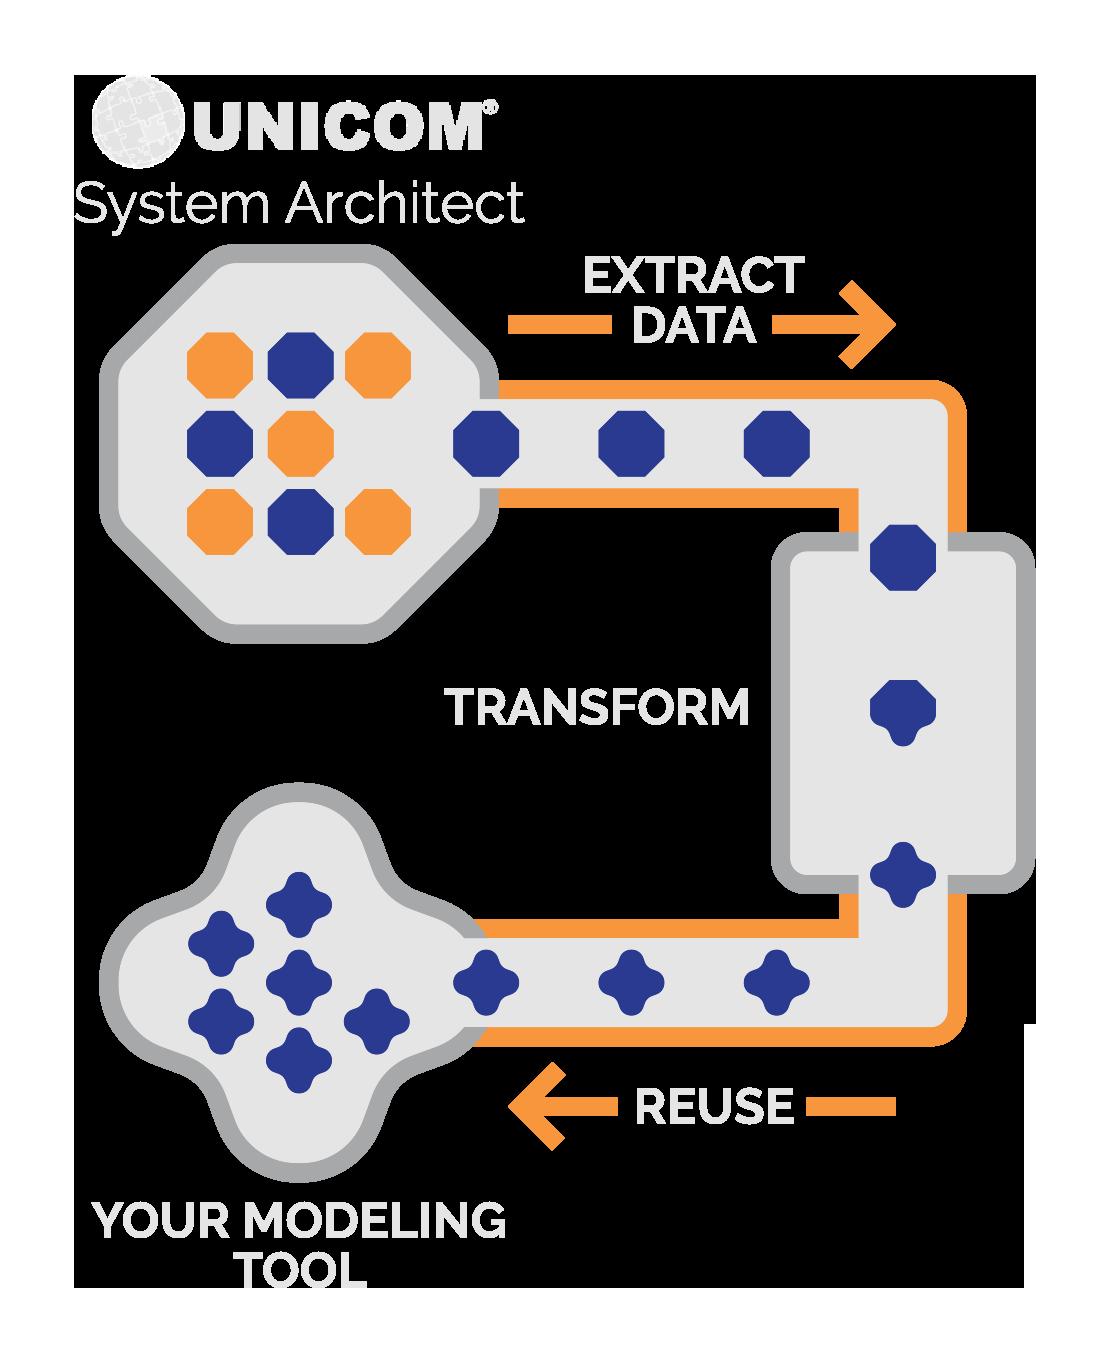 UNICOM System Architect